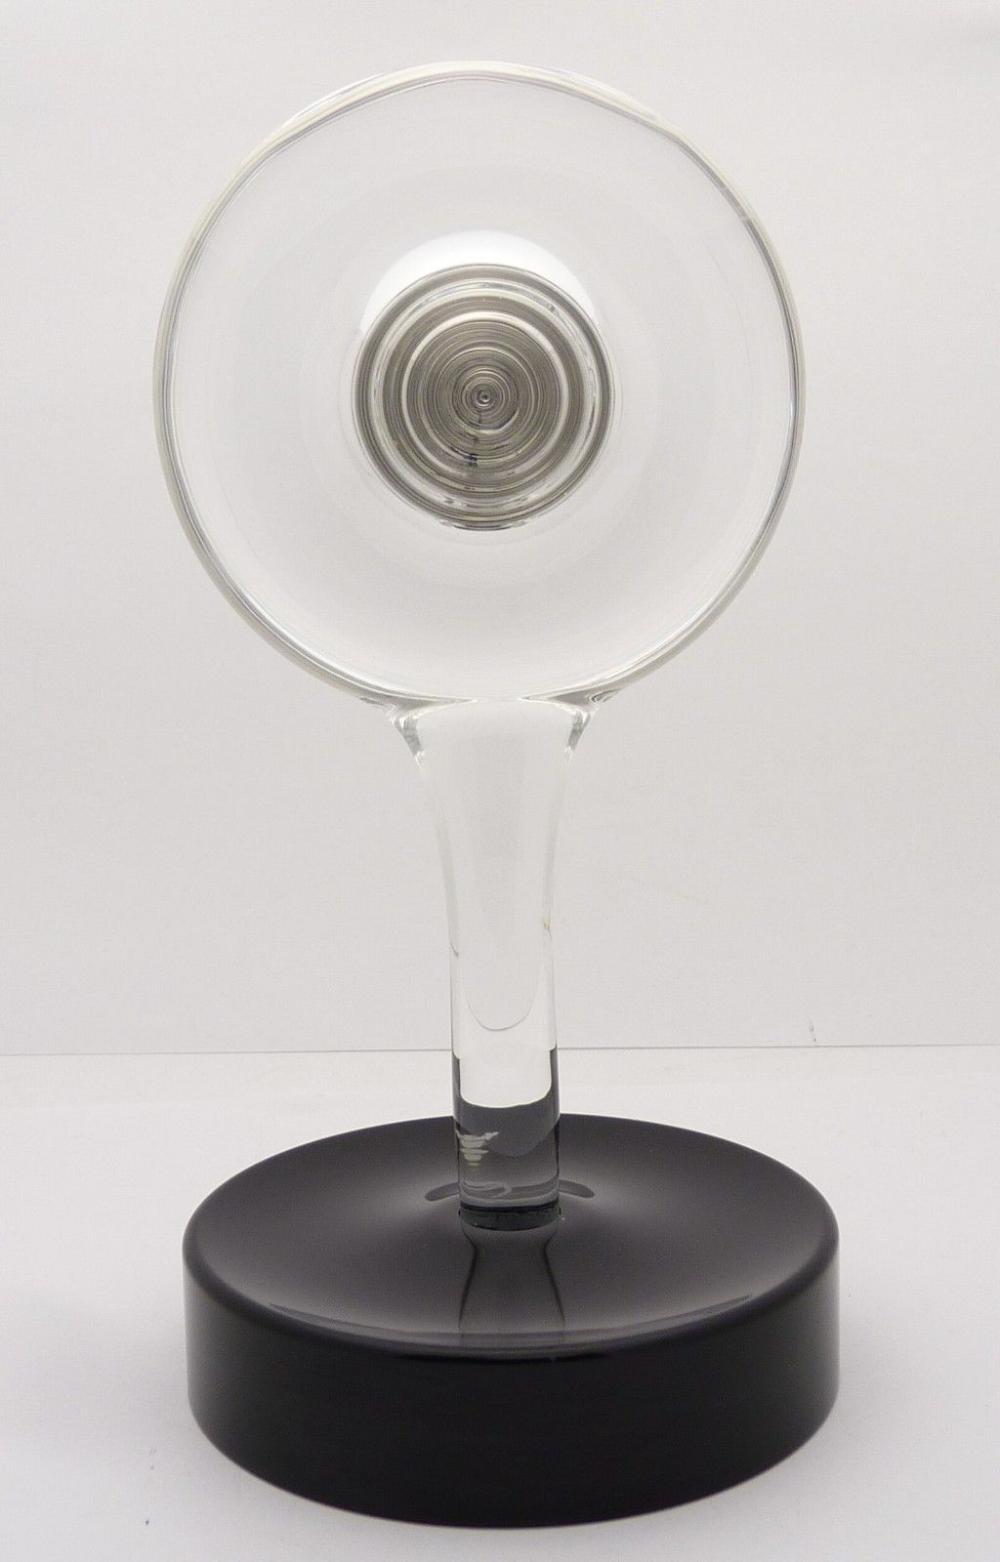 Baccarat France Crystal Table Desk Hypnos Clock